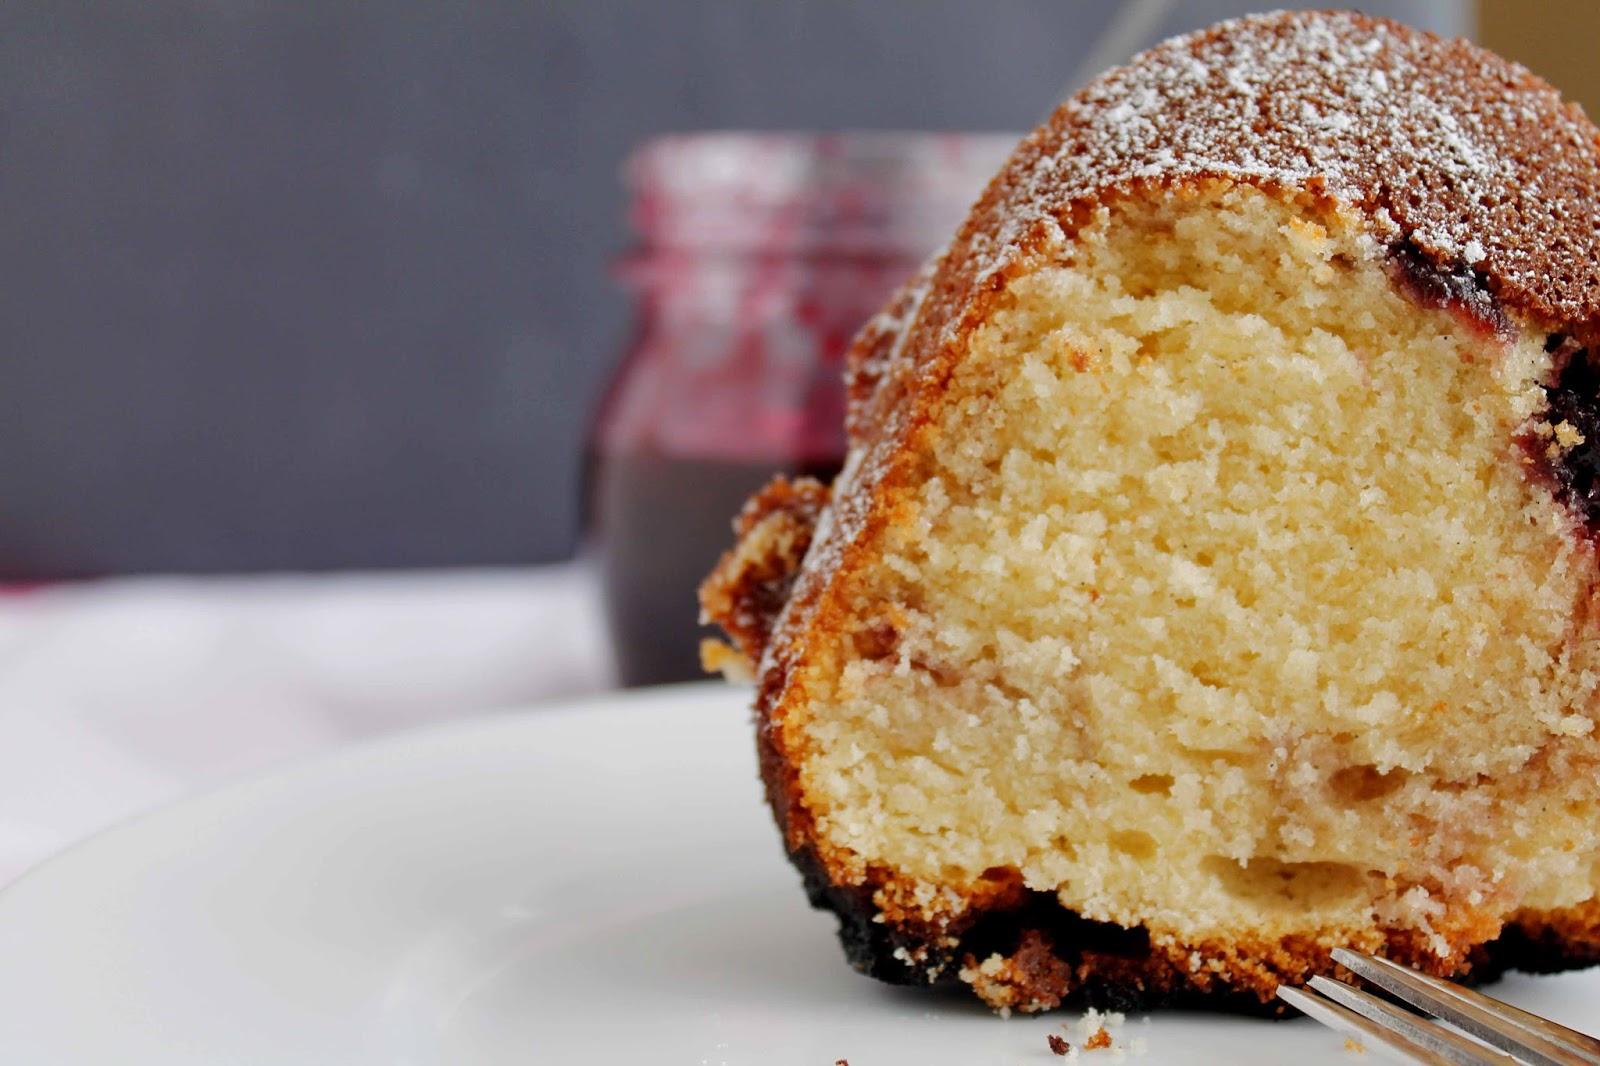 Receta Butter & Jam Bundt cake o Bundt cake de cerezas